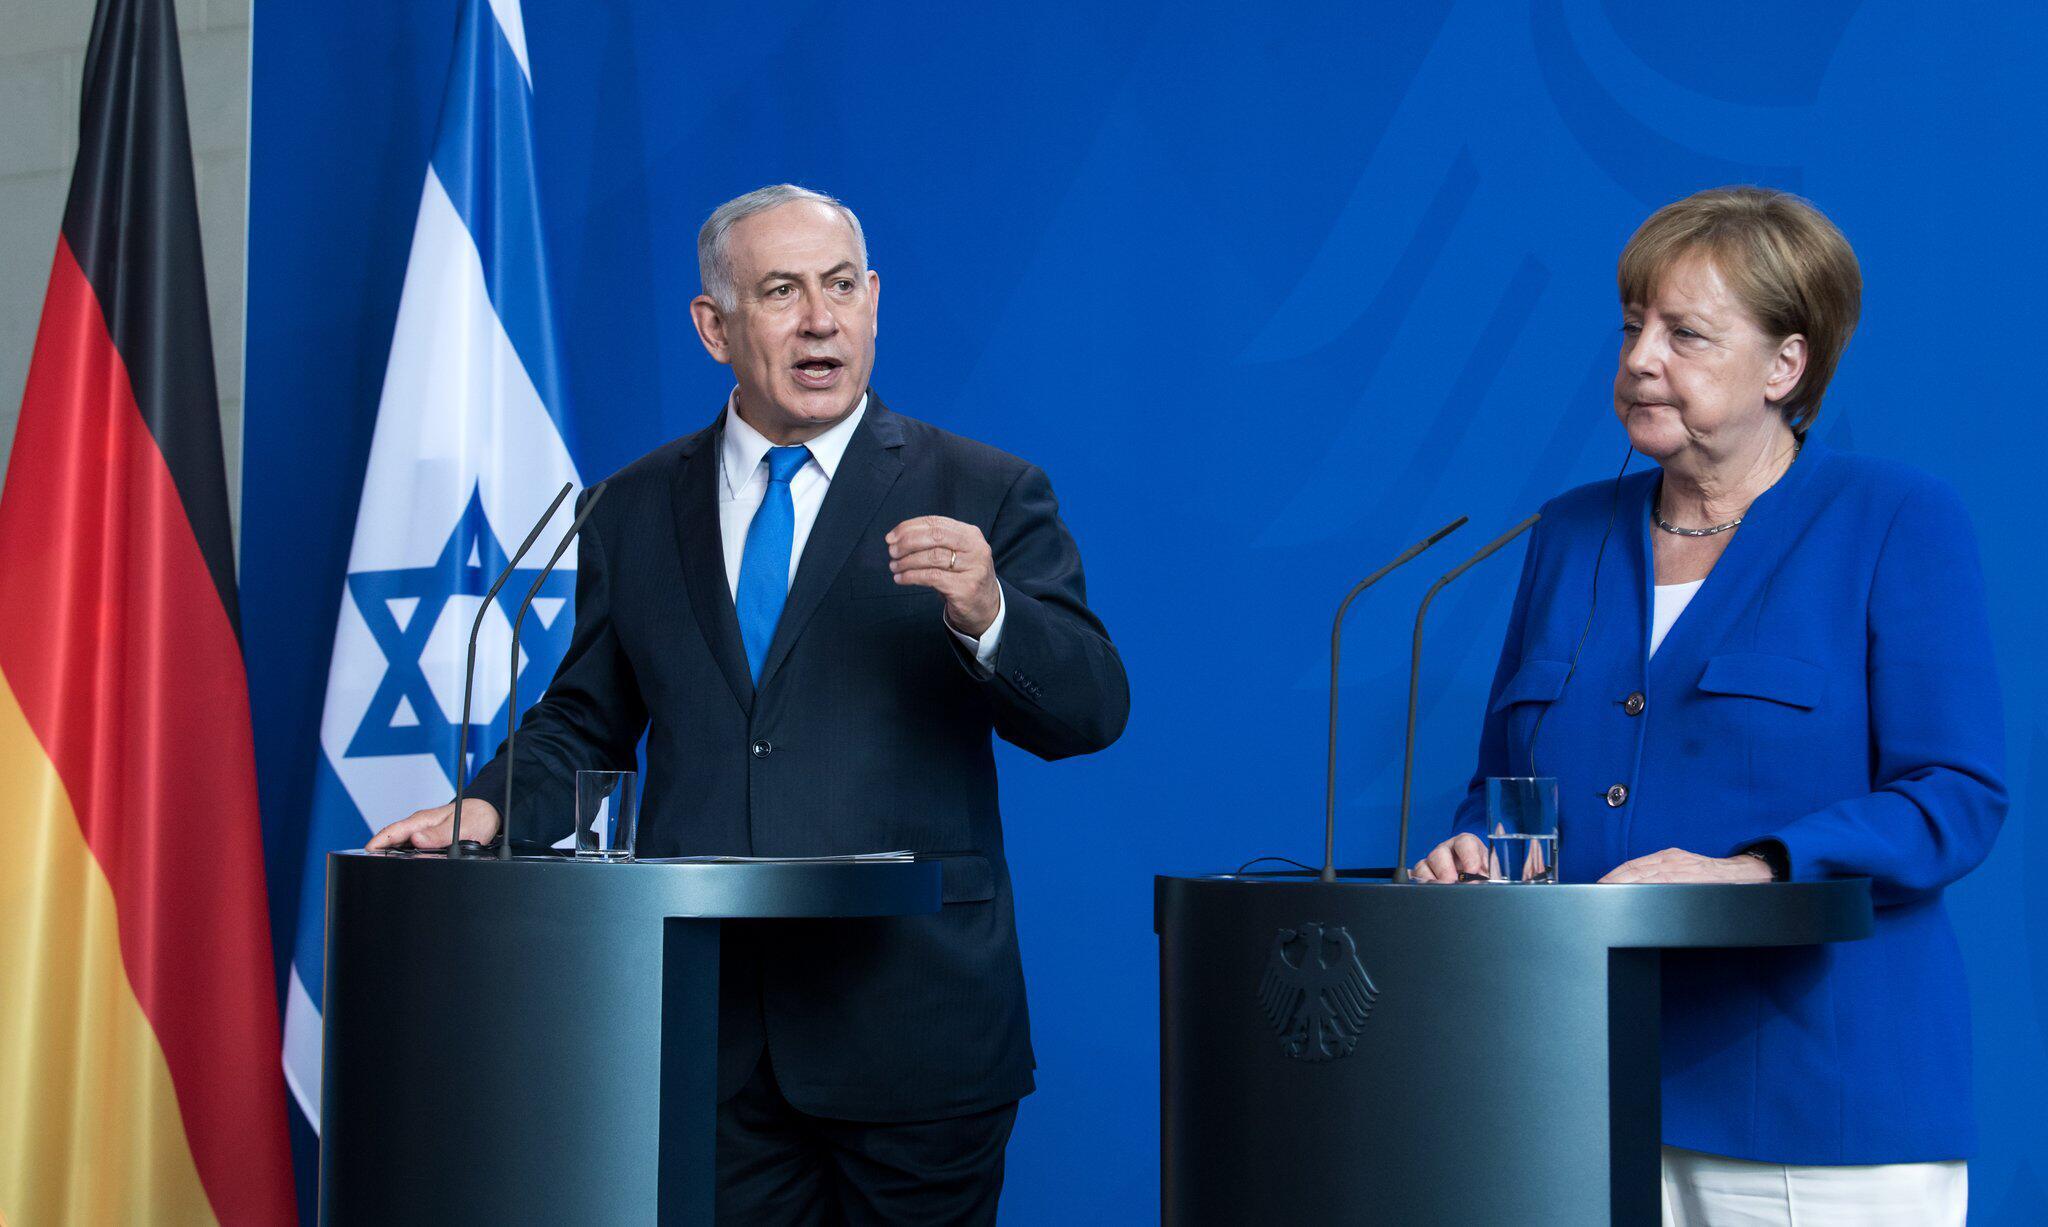 Bild zu Israels Ministerpräsident Netanjahu bei Kanzlerin Merkel